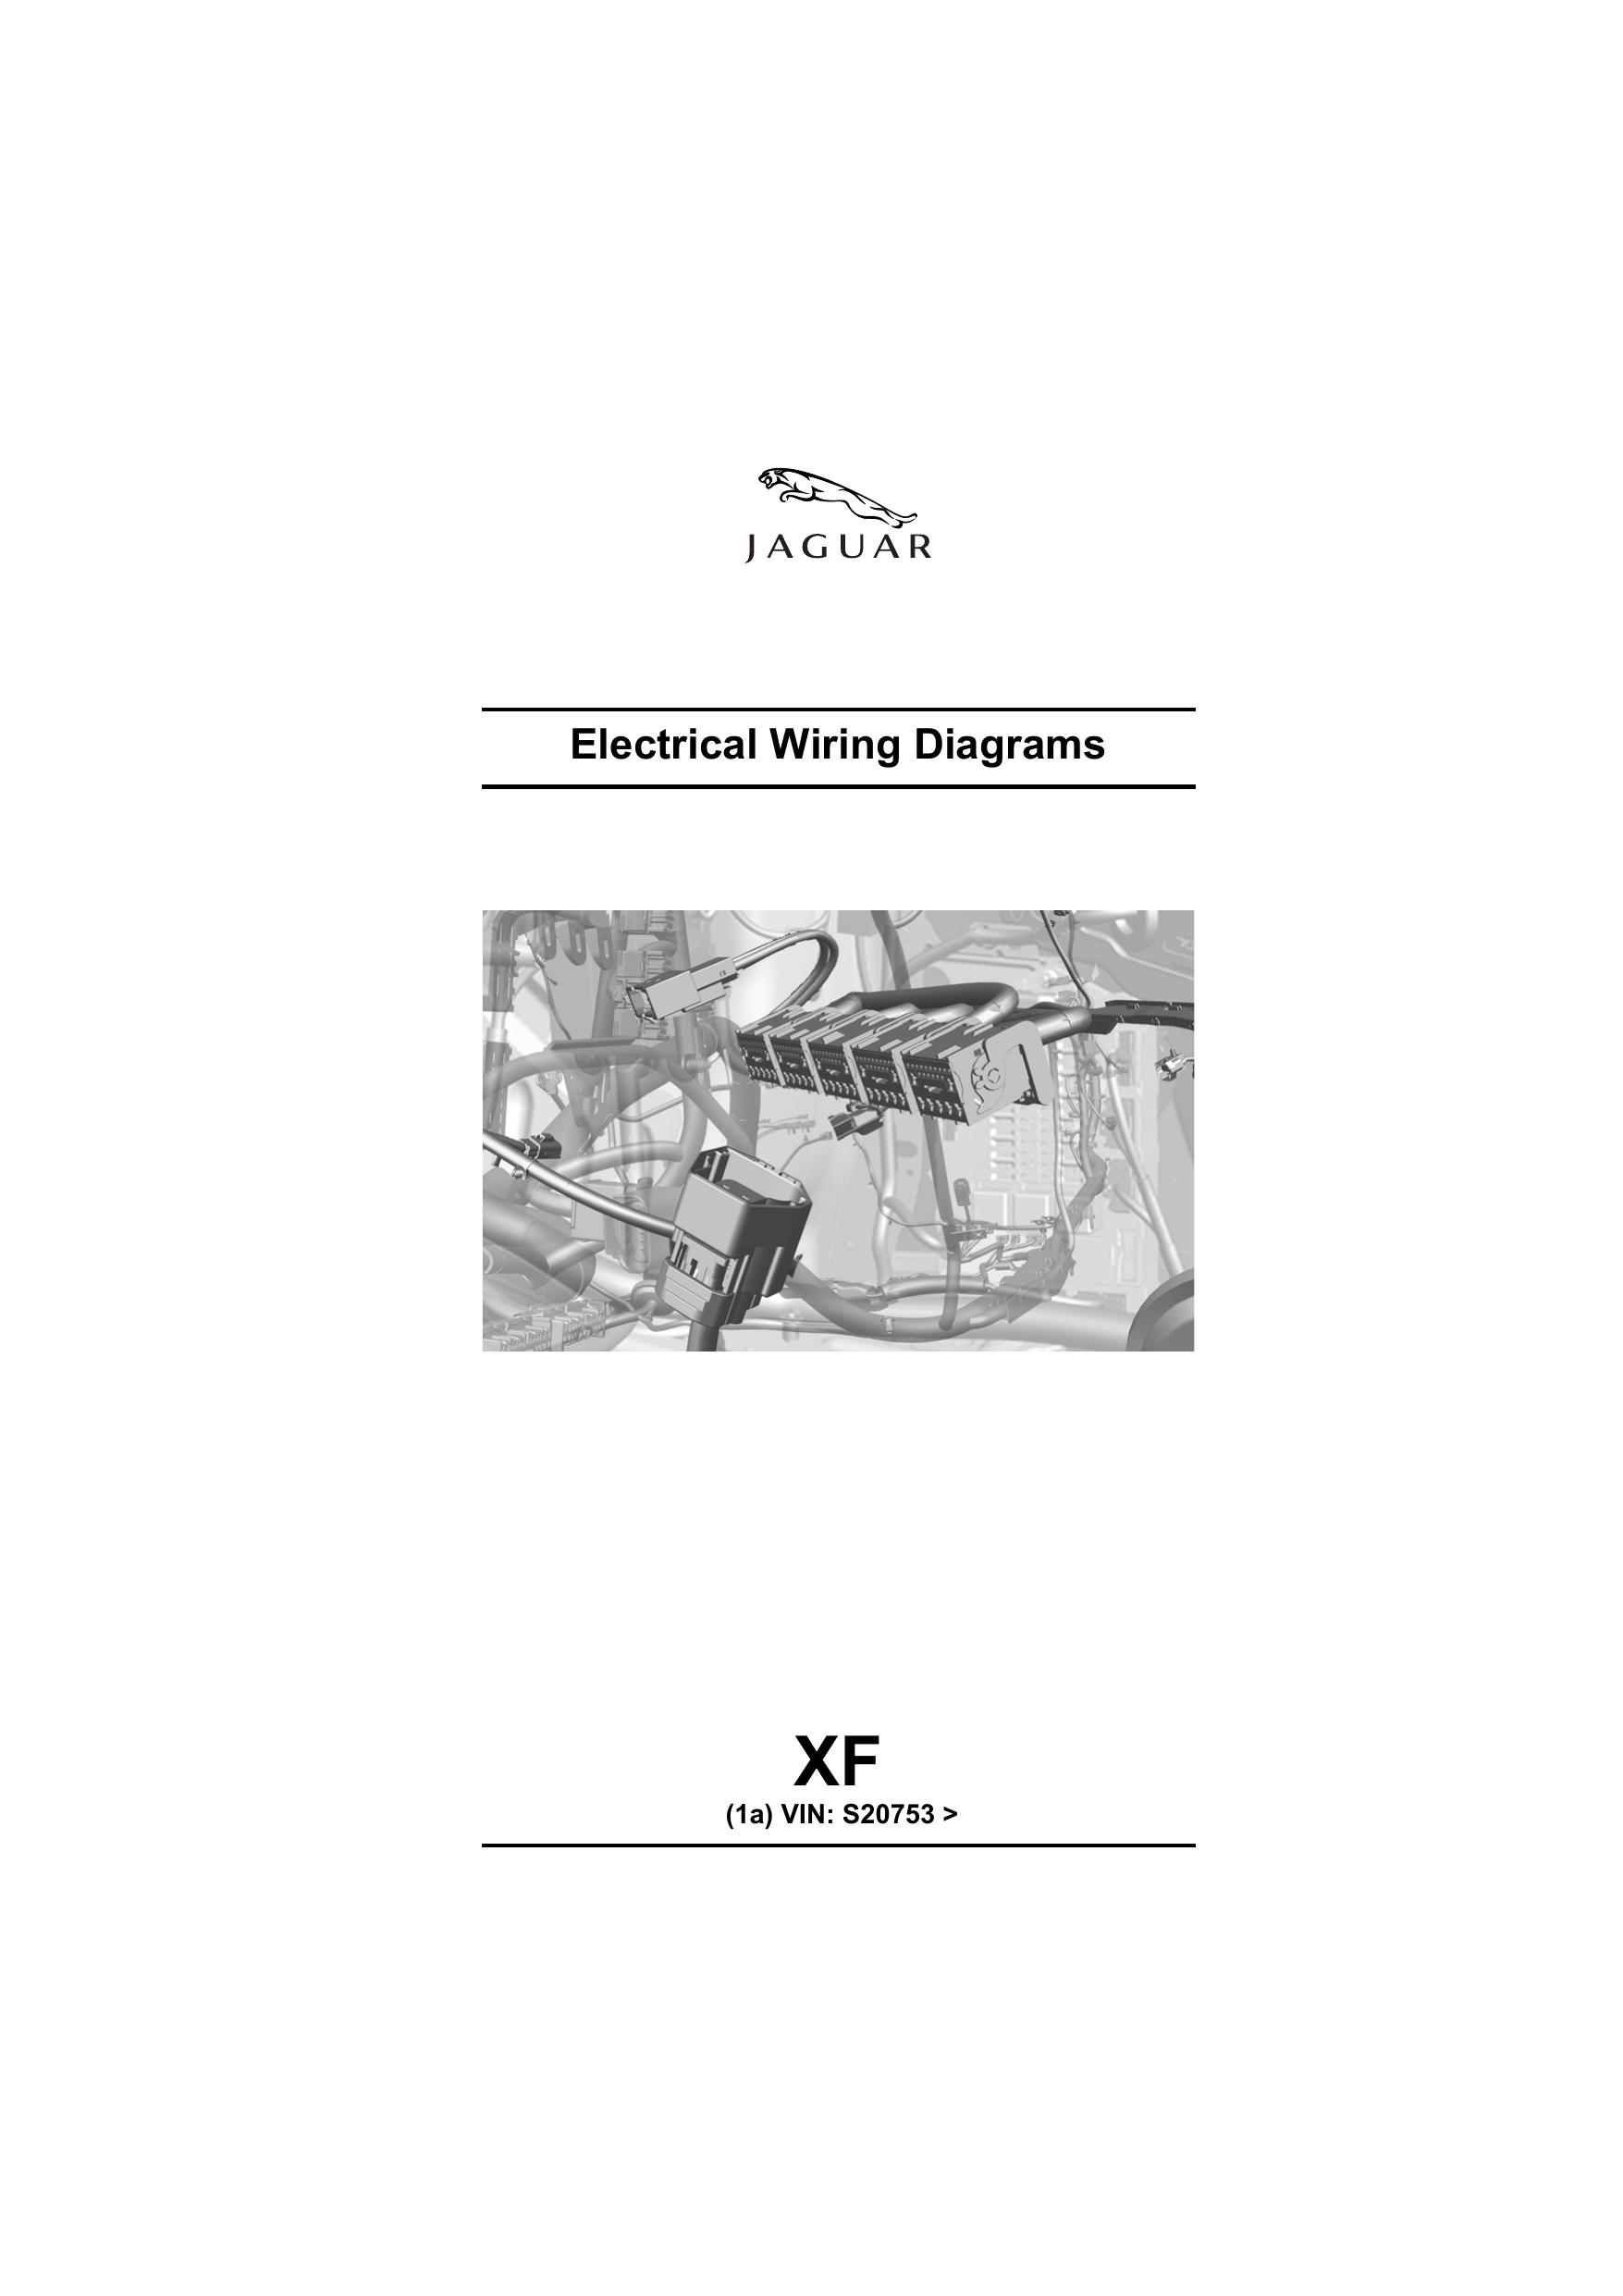 Electrical Wiring Diagrams   manualzz.com on xjs wiring diagram, xj6 wiring diagram, xk120 wiring diagram,